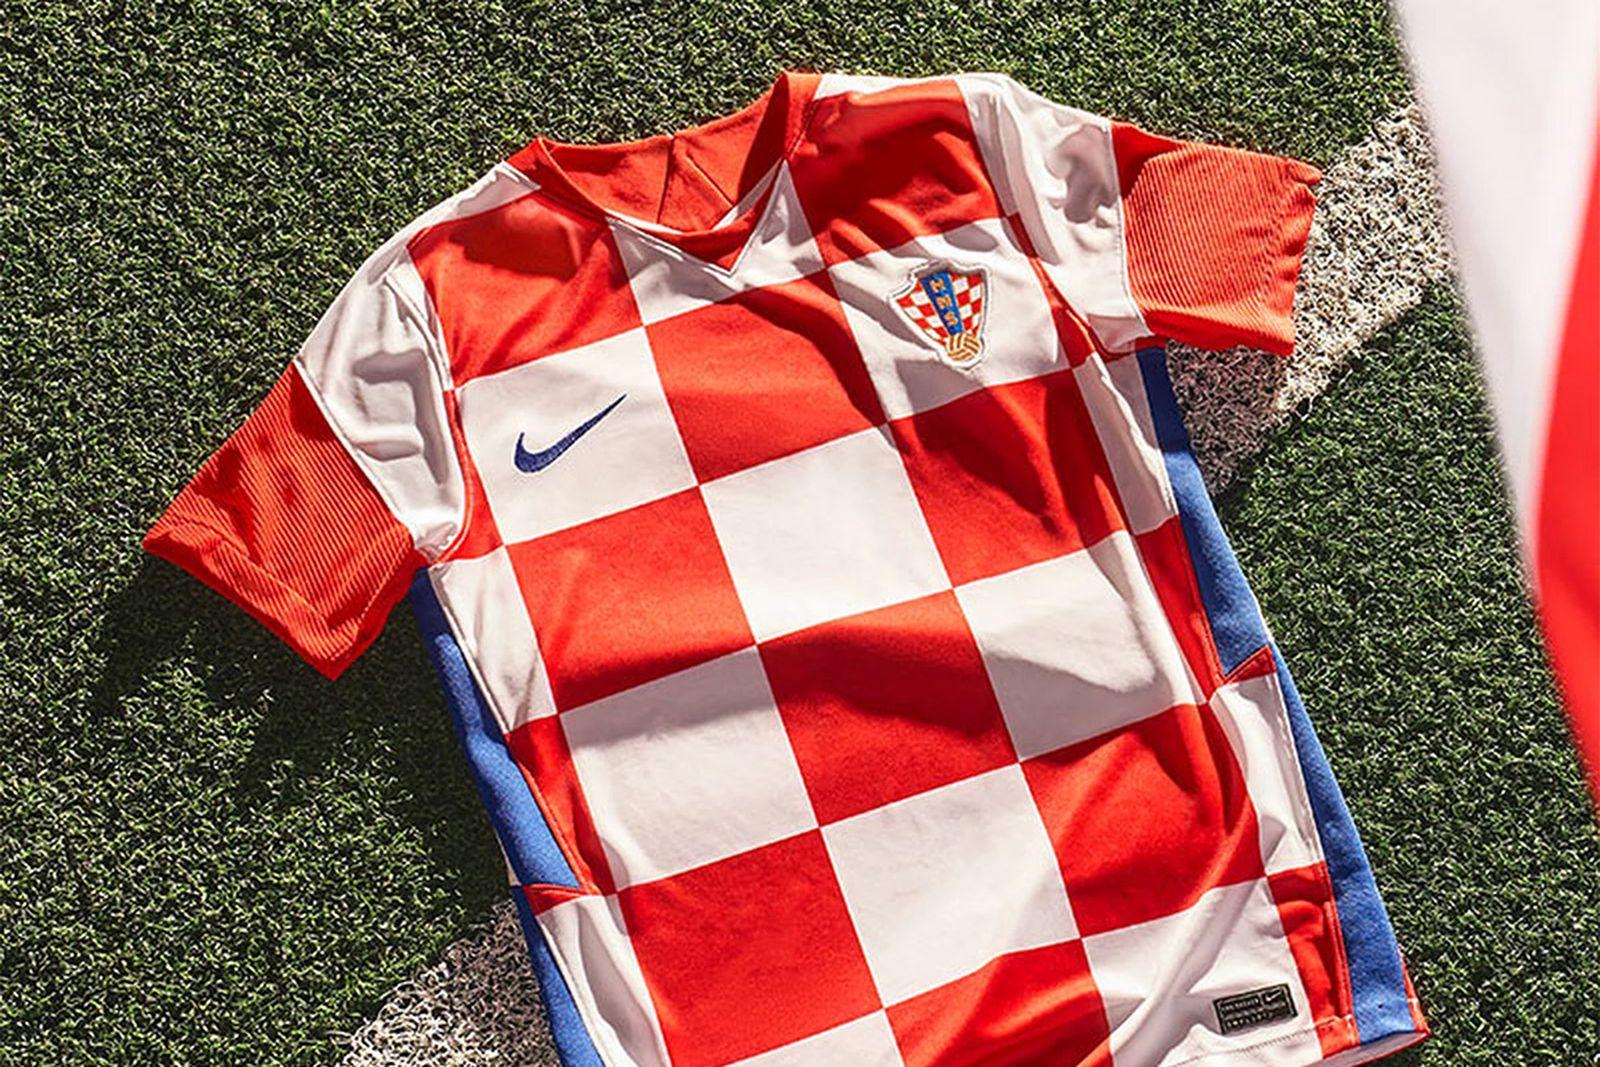 nike-national-team-kits-2020-ranking-main